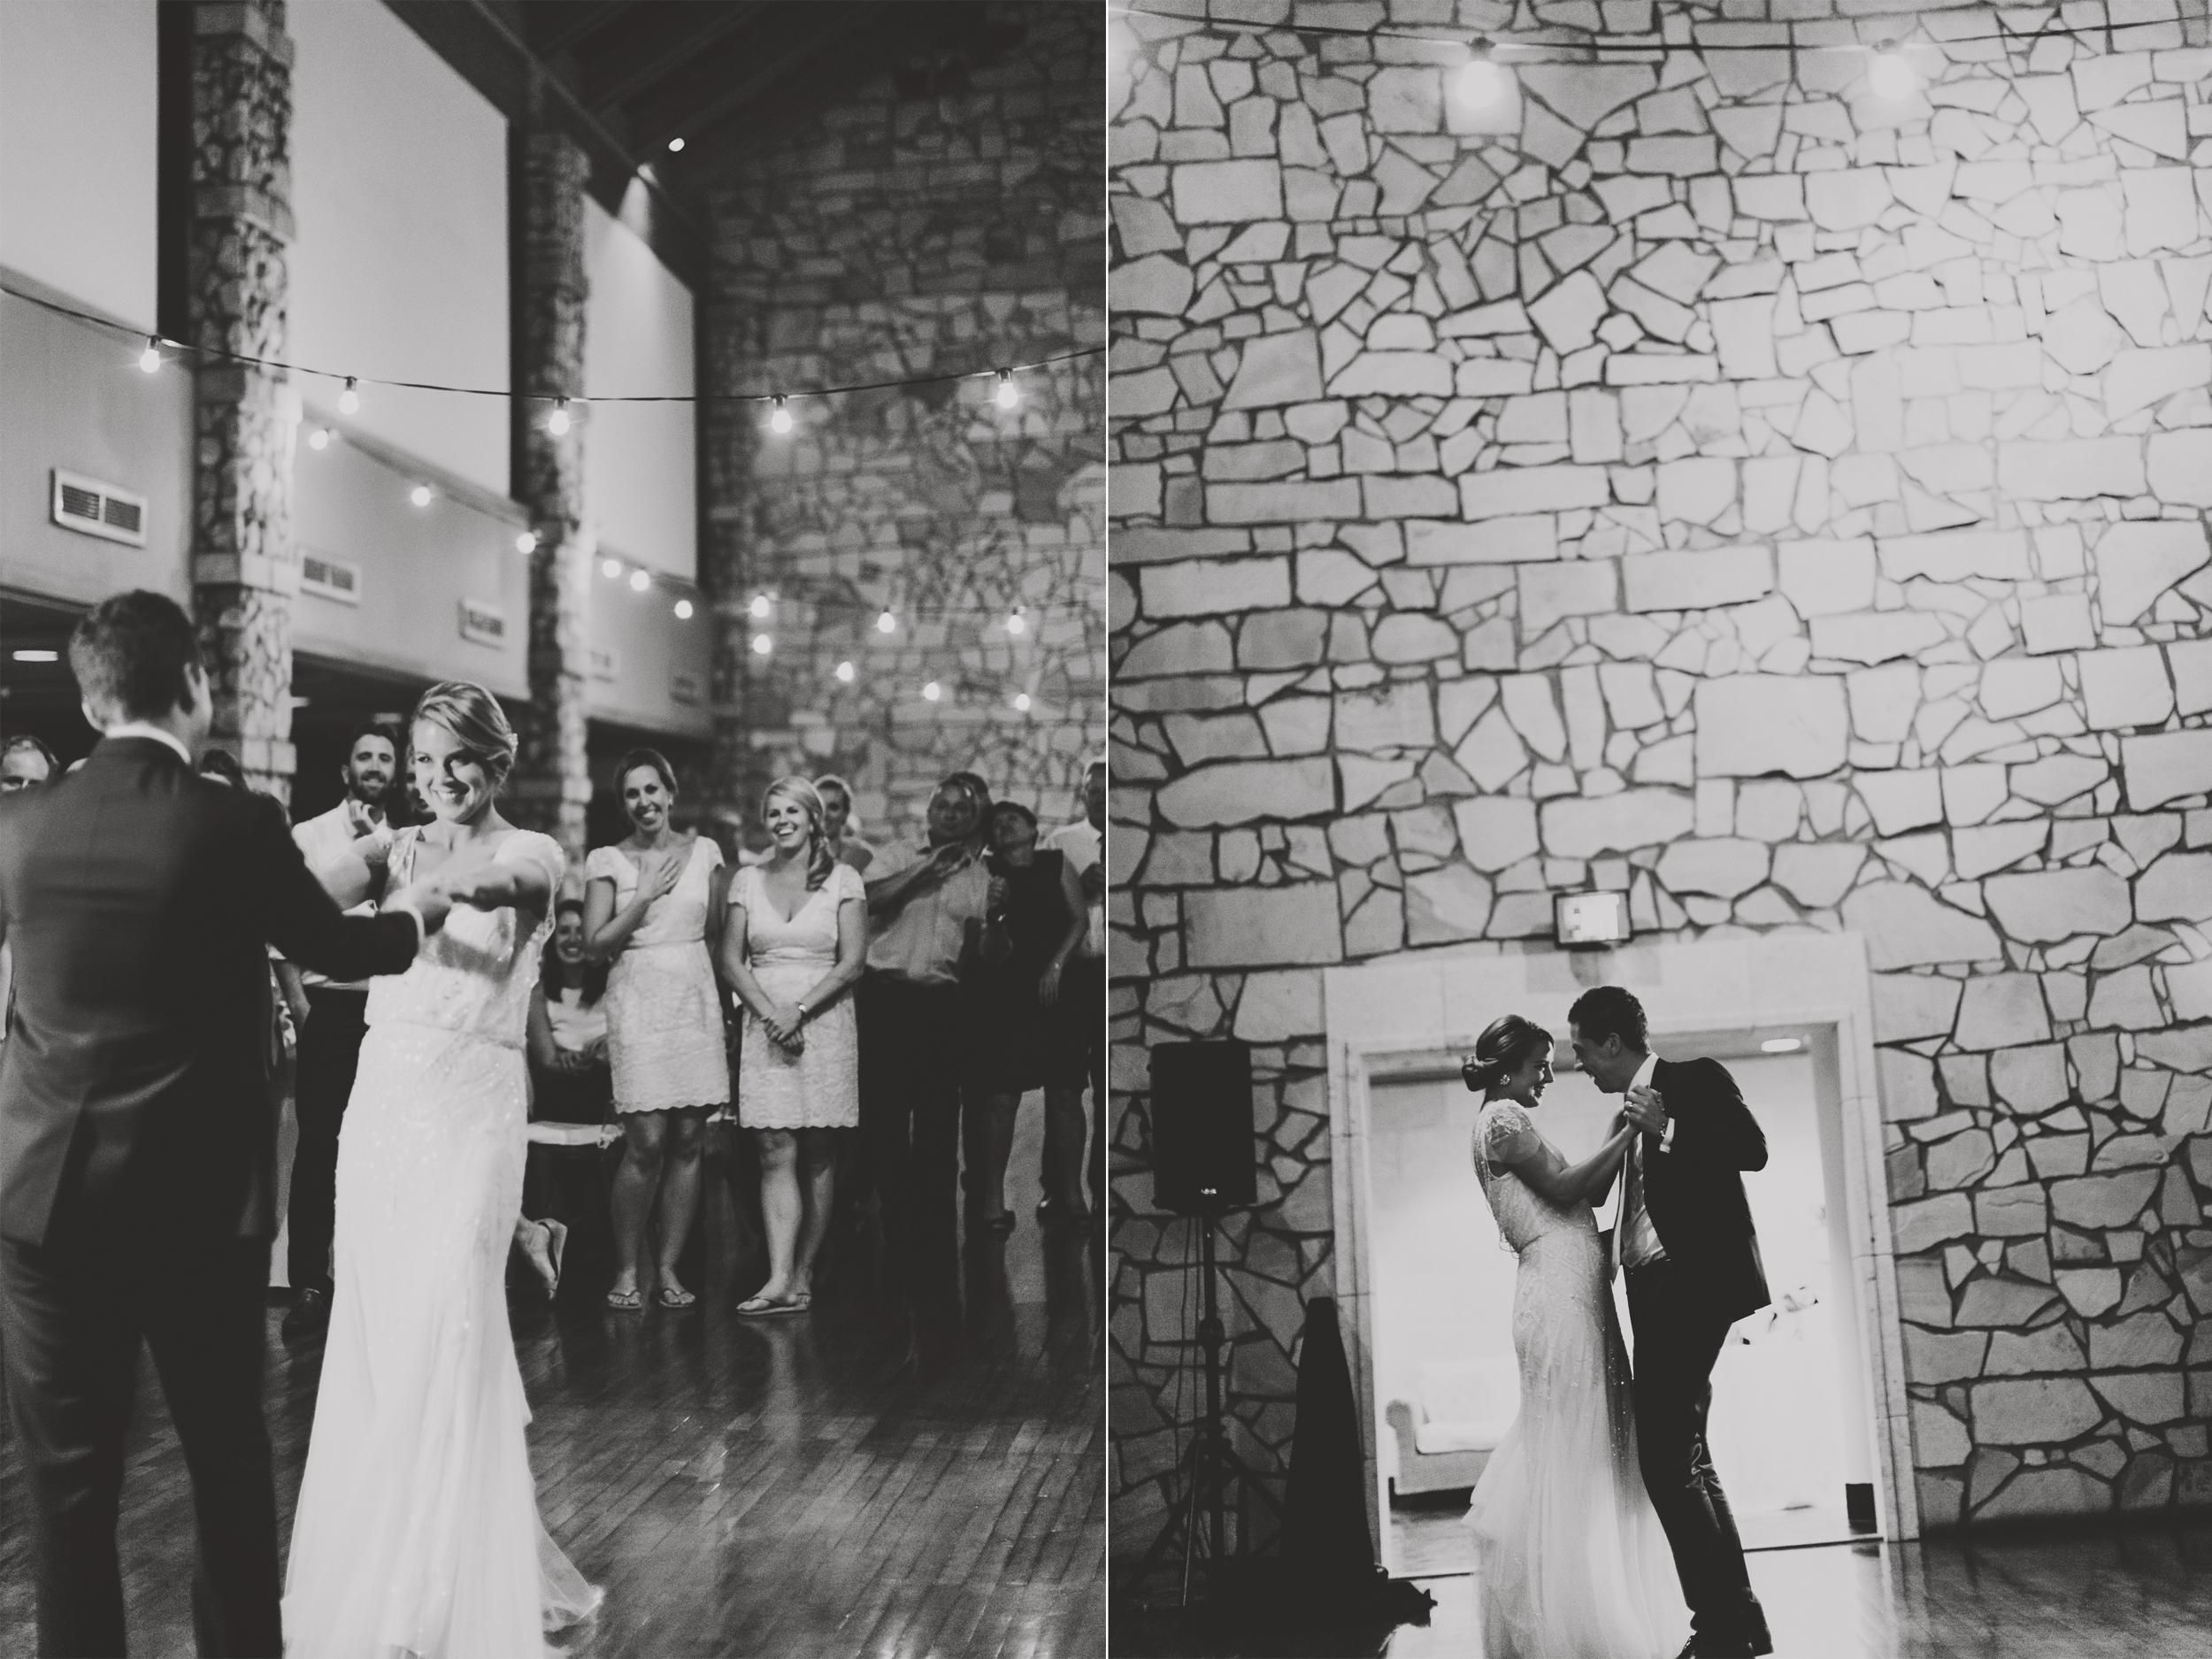 angie-diaz-photography-maui-wedding-mel-matt-110.jpg